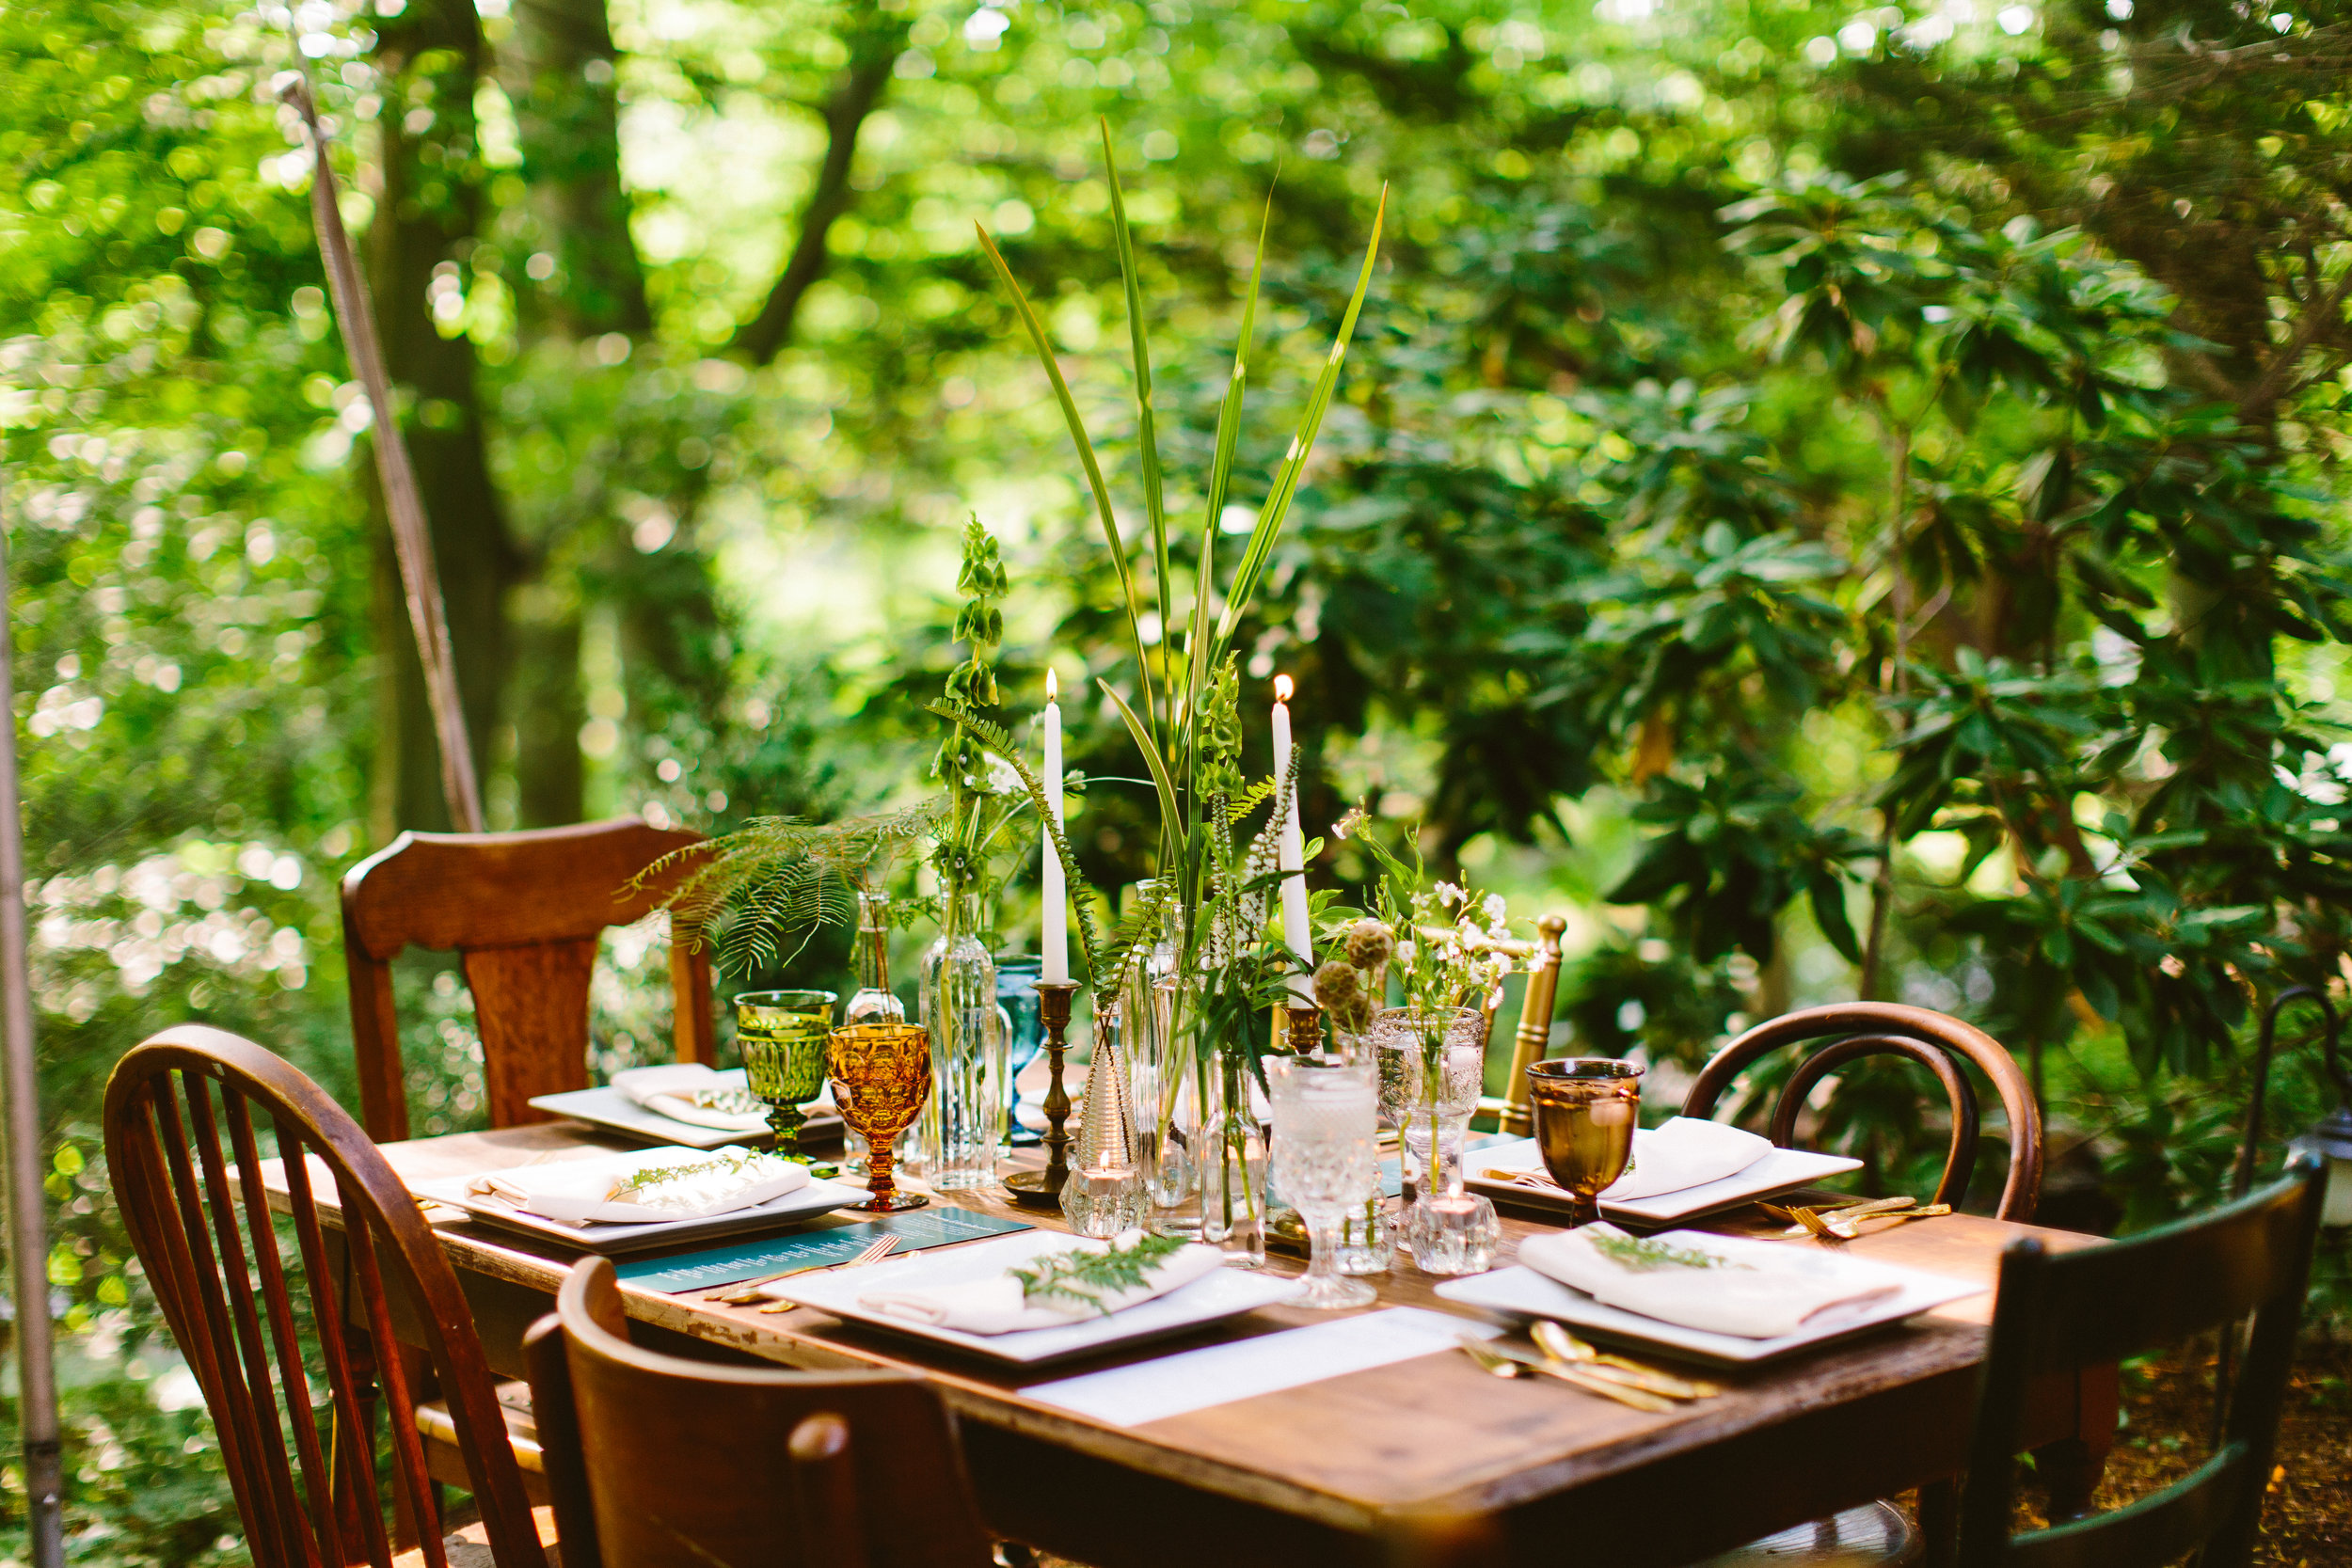 West-Chester-PA-Faunbrook-Harvest-Dinner-Series-Cucumber-Redfield-10.jpg